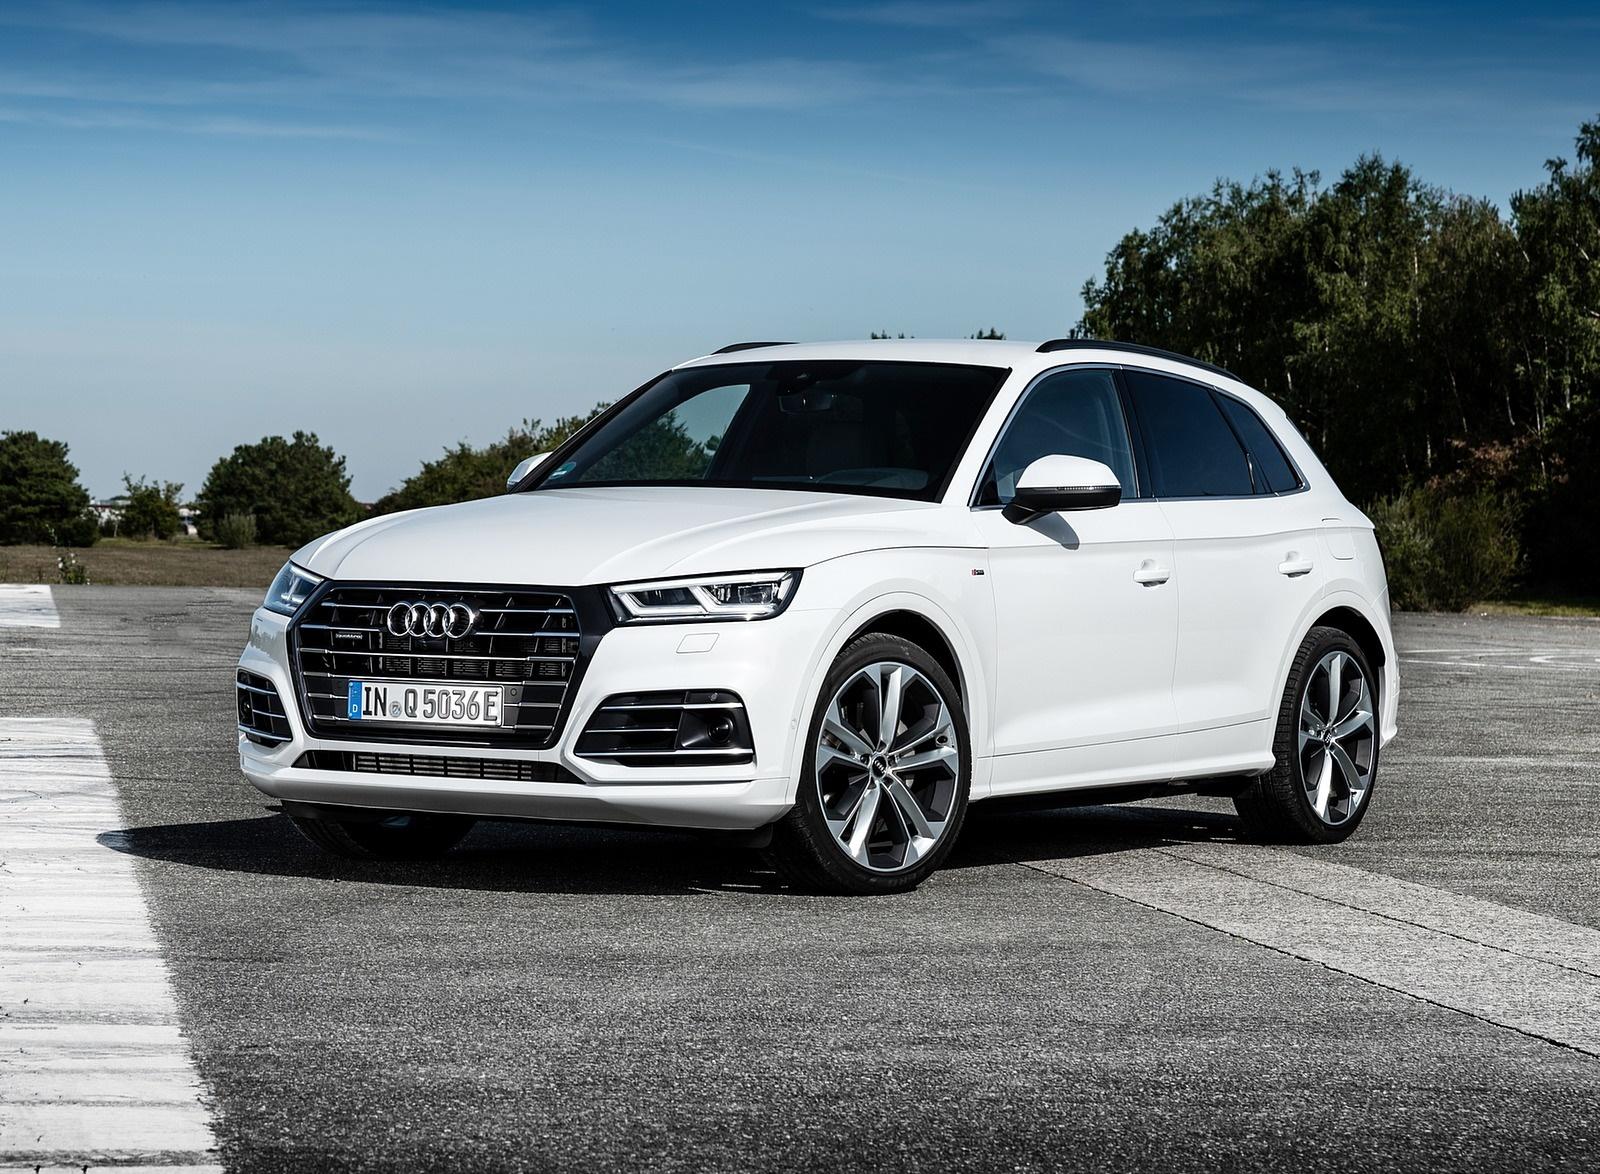 2020 Audi Q5 TFSI e Plug-In Hybrid (Color: Glacier White) Front Three-Quarter Wallpapers #26 of 154